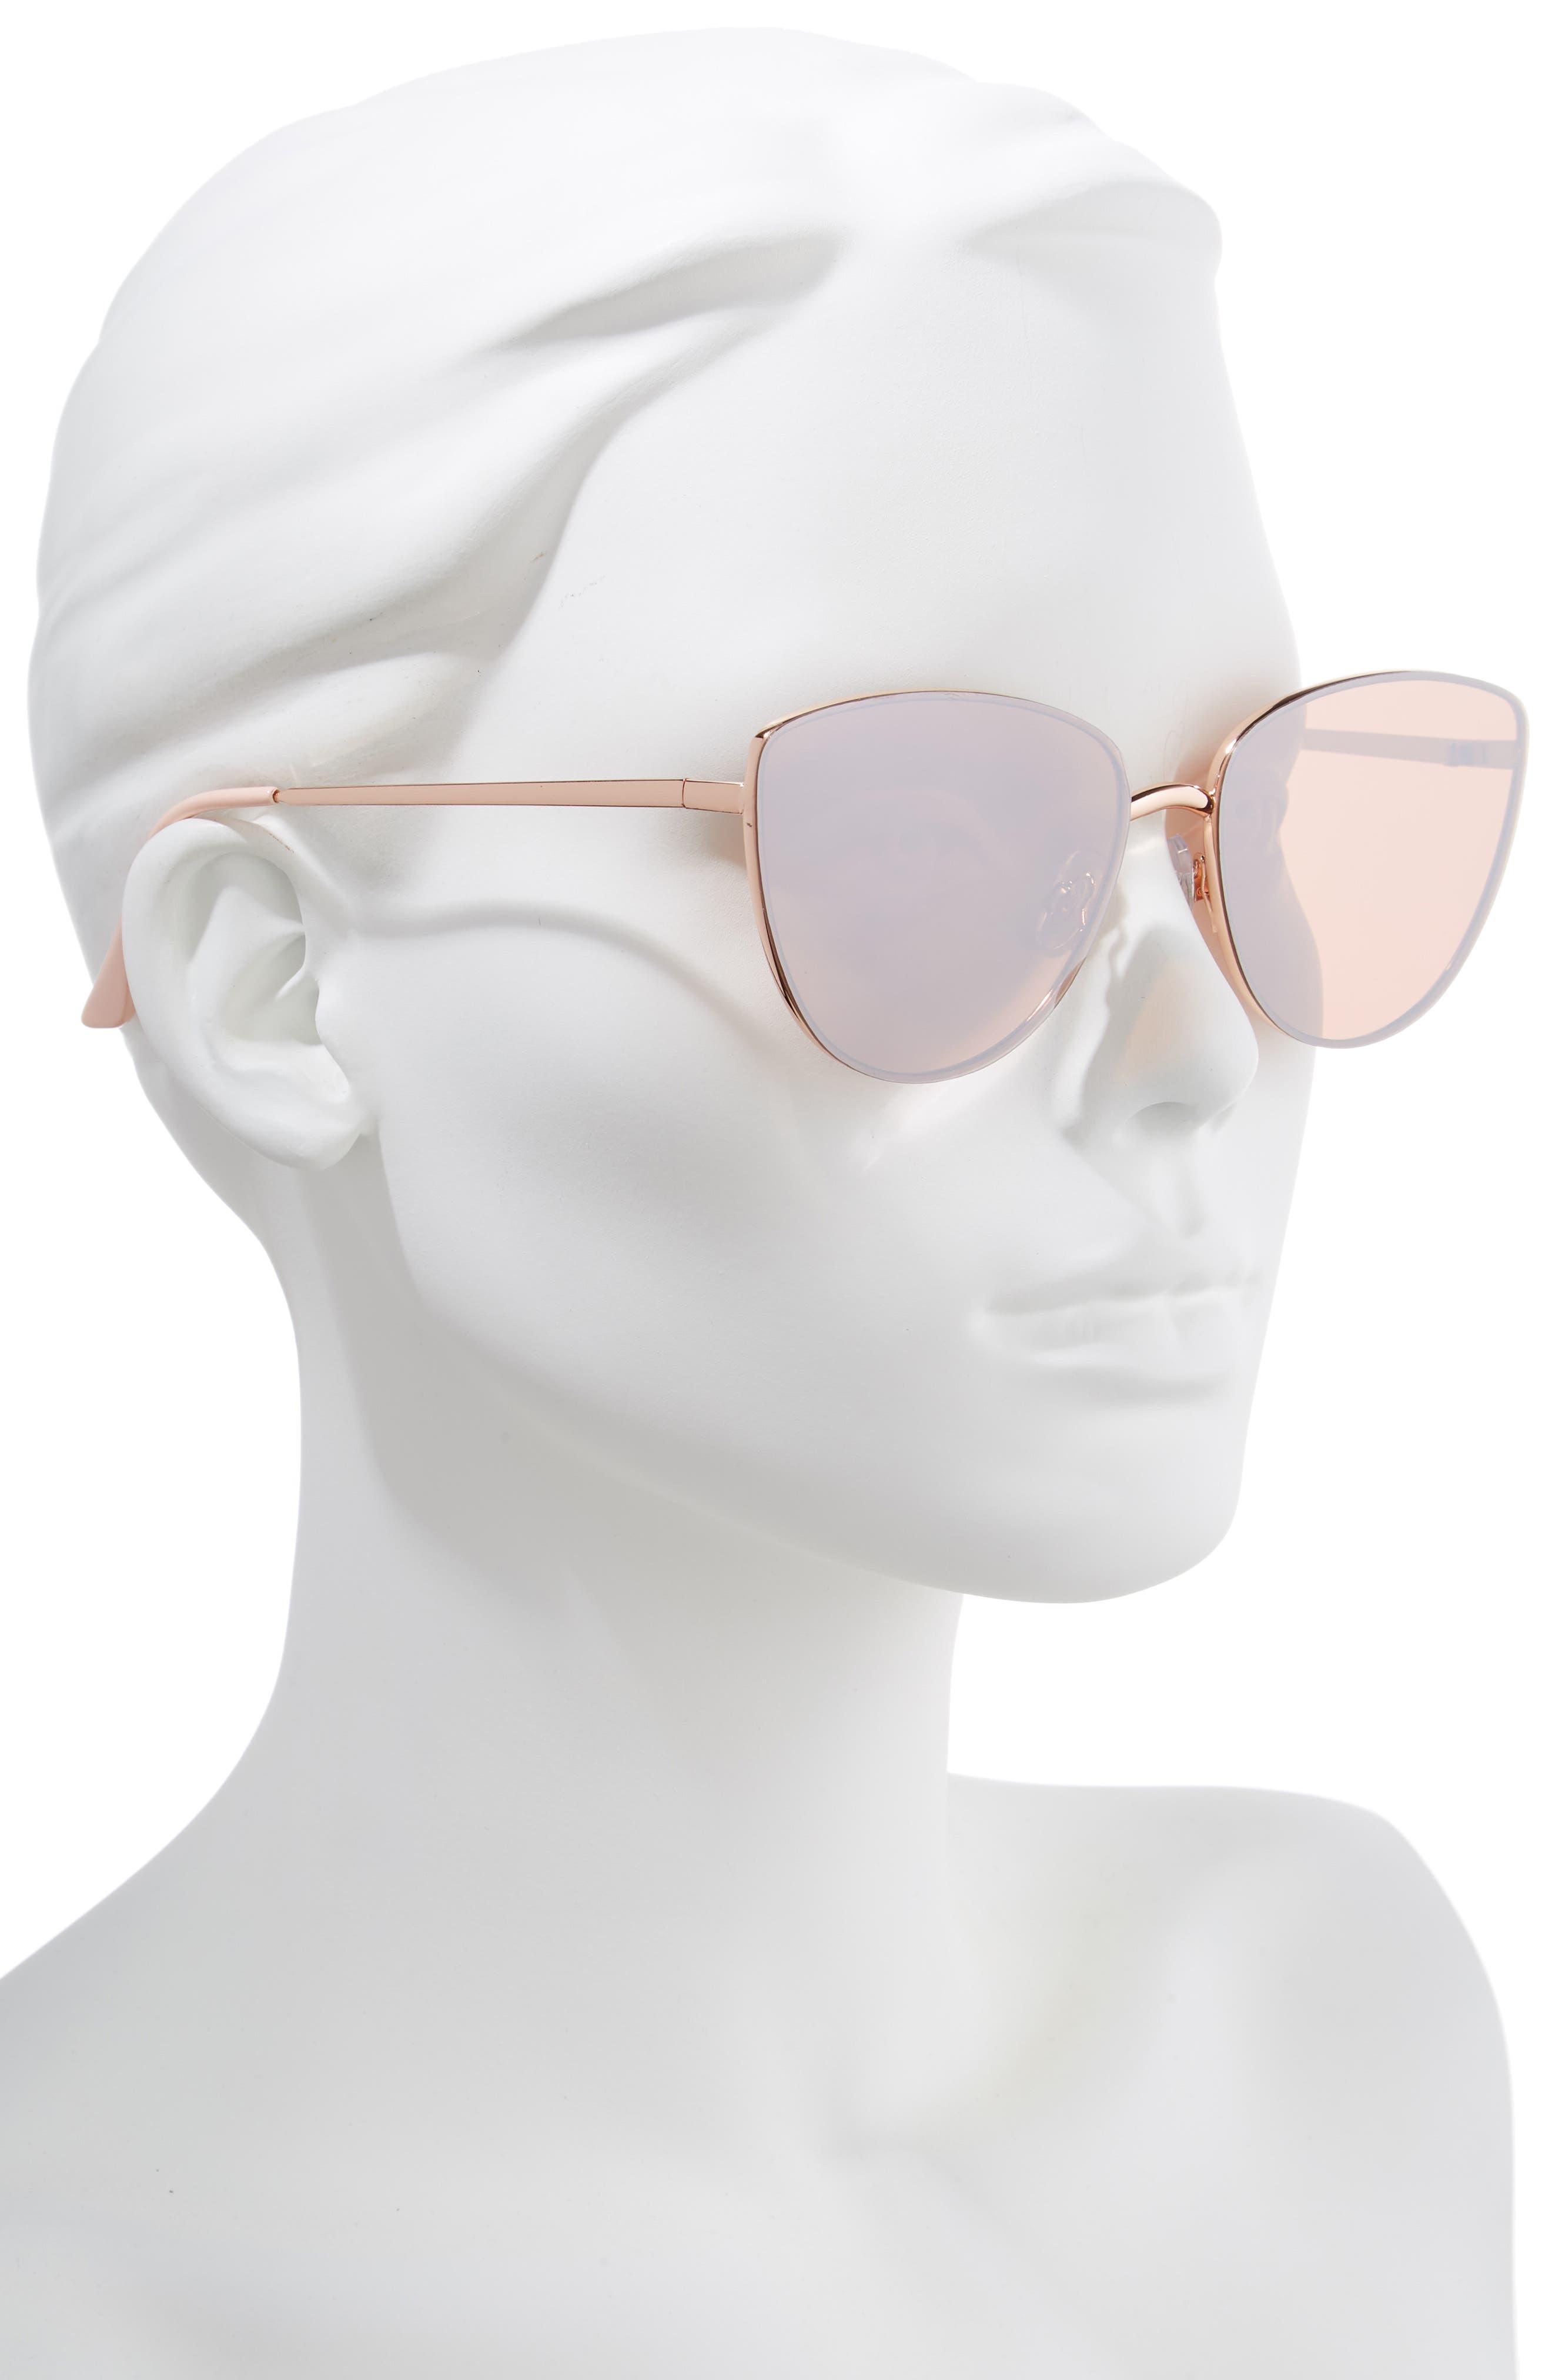 Rimless Cat Eye Sunglasses,                             Alternate thumbnail 2, color,                             ROSE GOLD